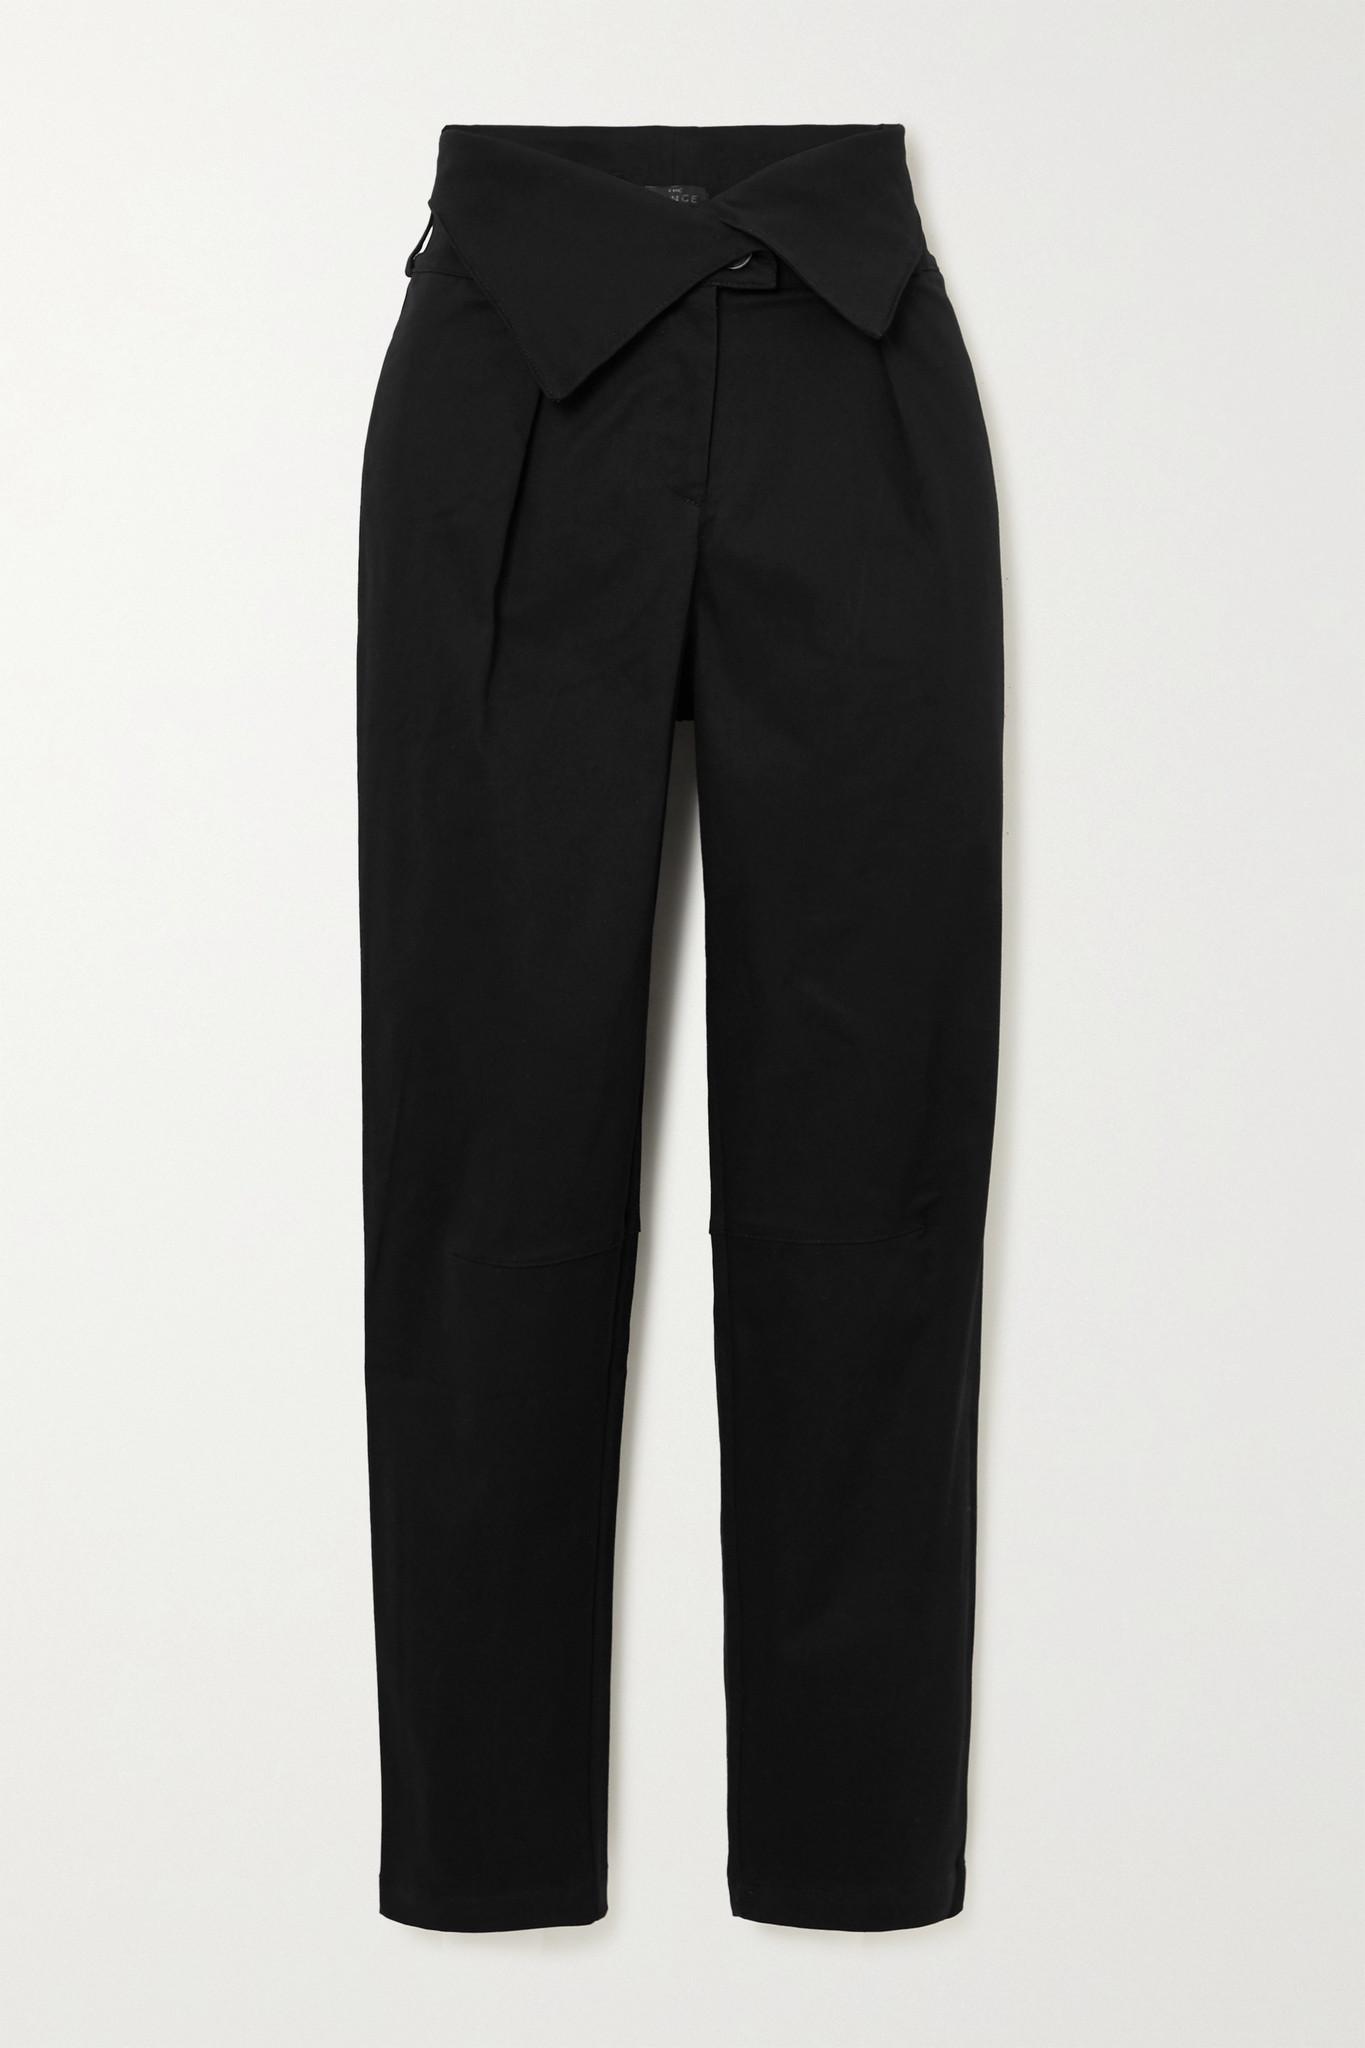 THE RANGE - 弹力棉质斜纹布锥形裤 - 黑色 - x small